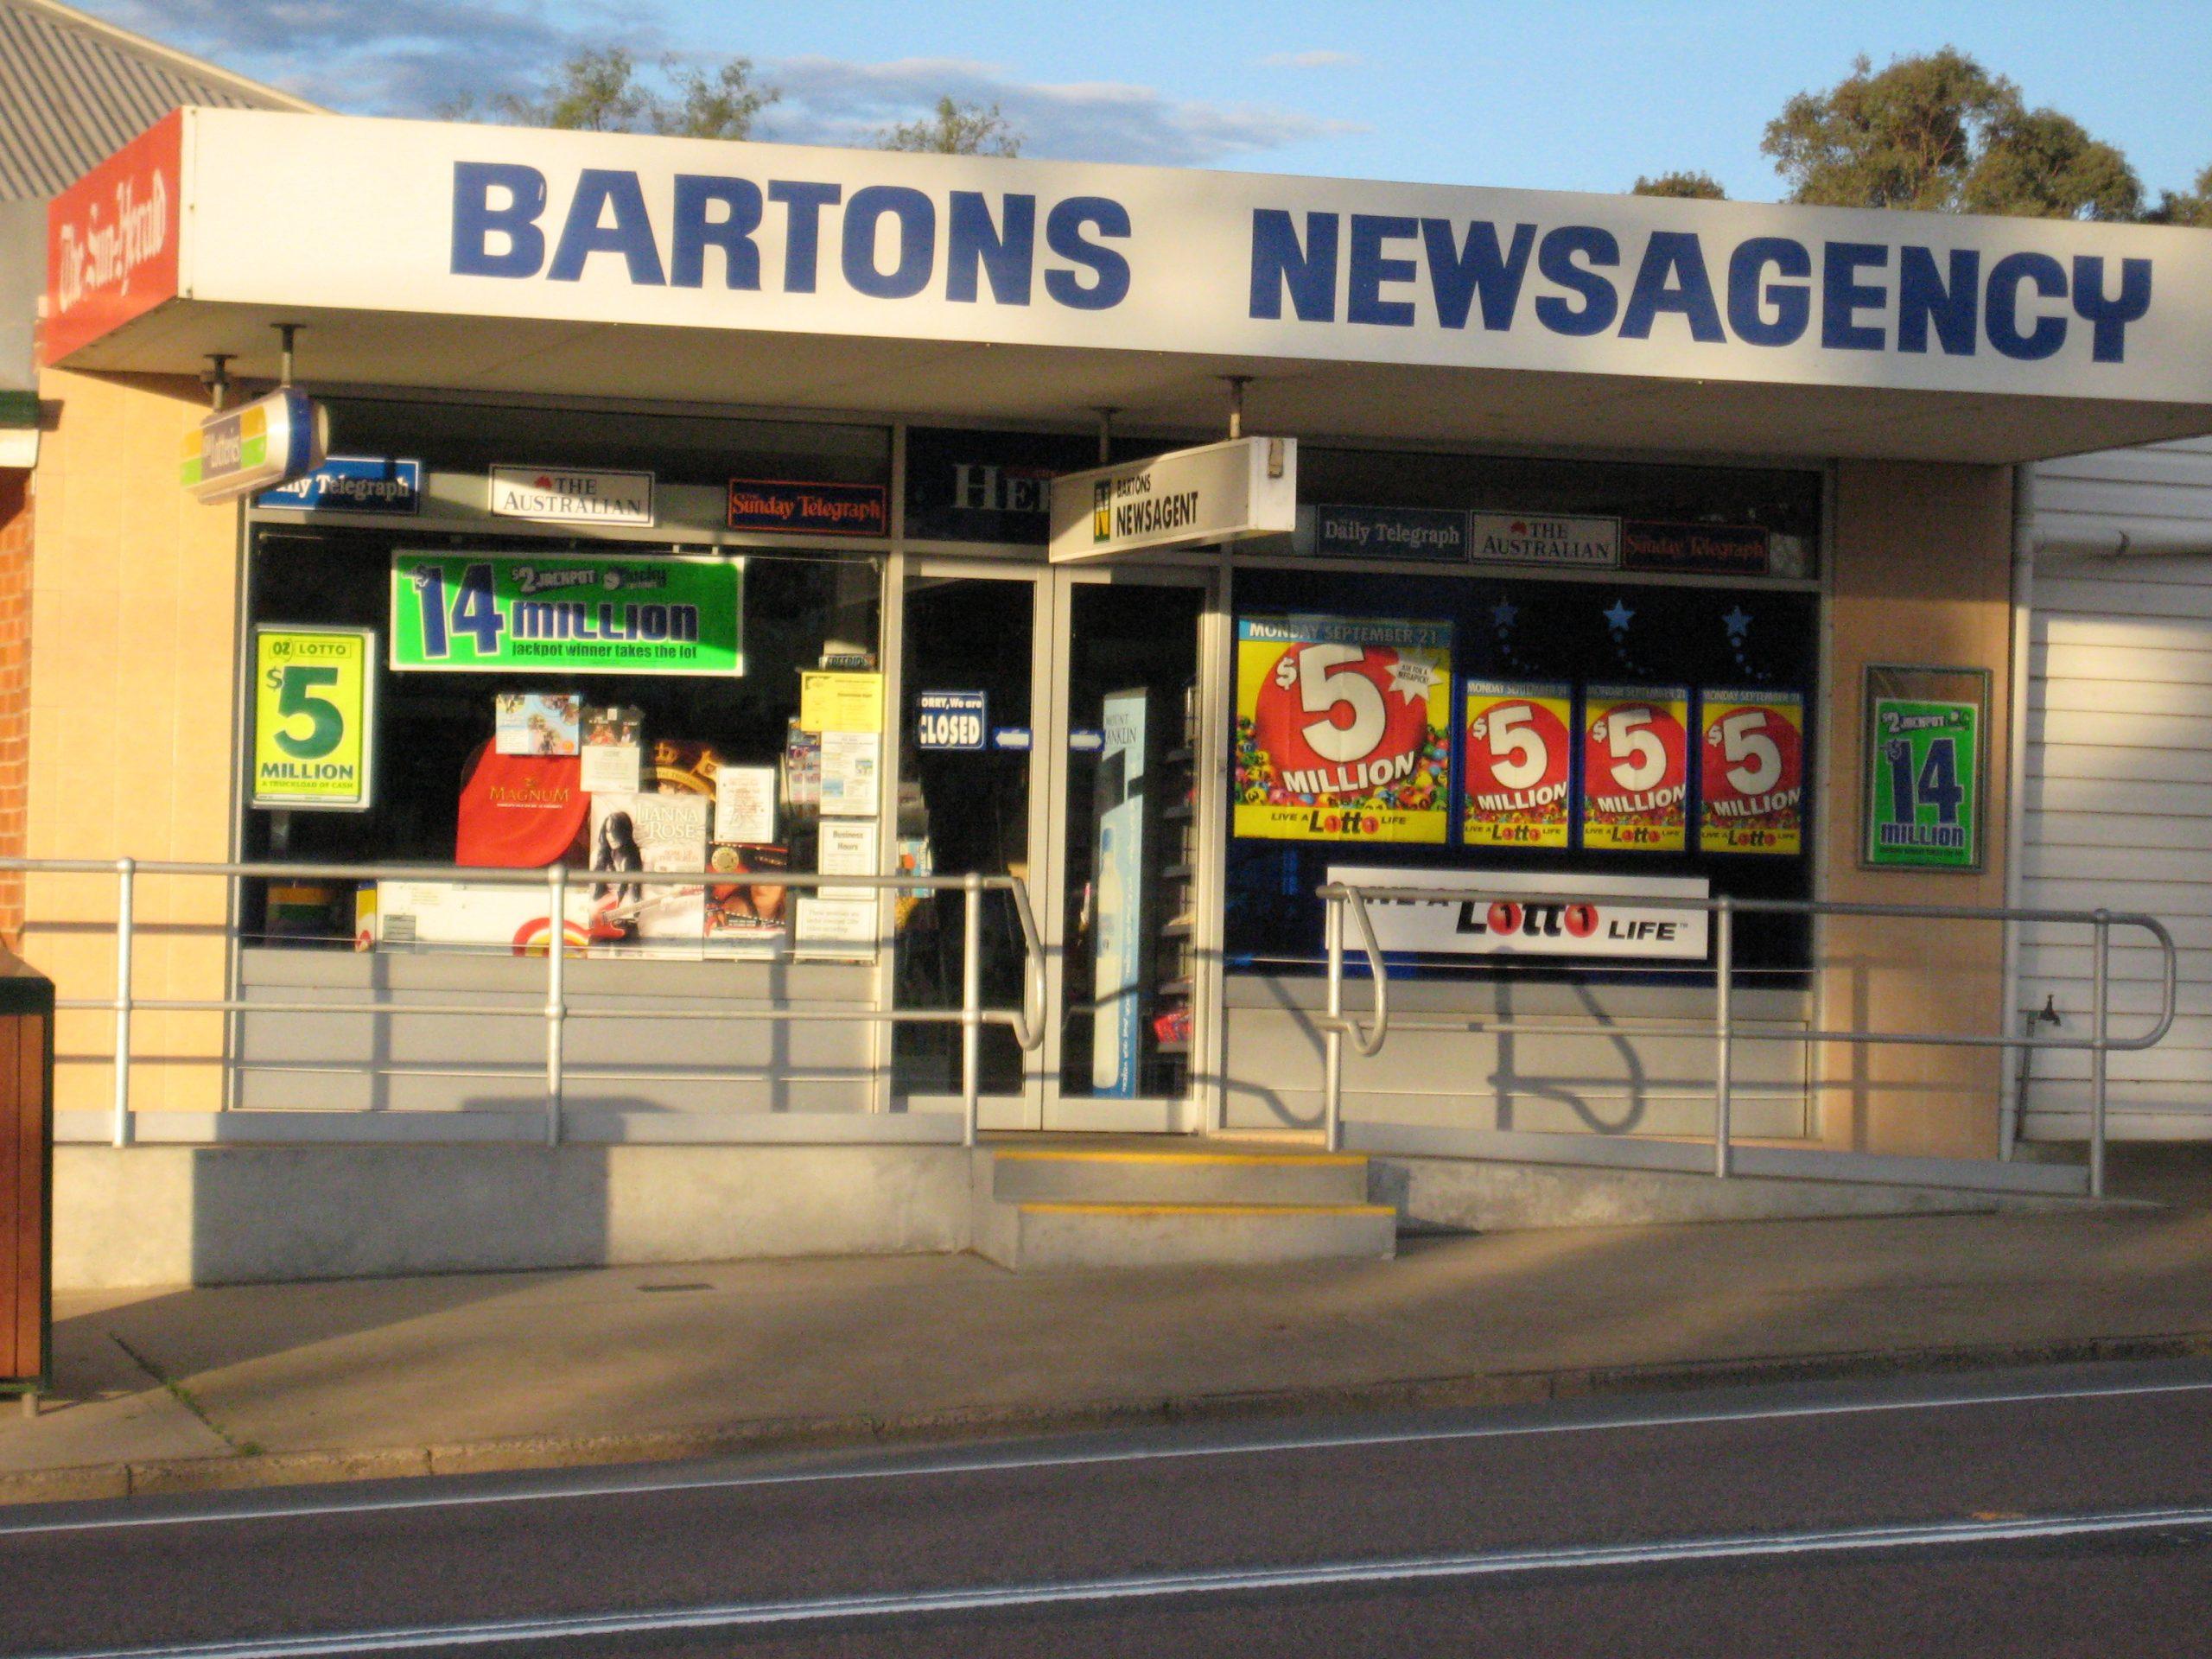 Bartons Newsagency